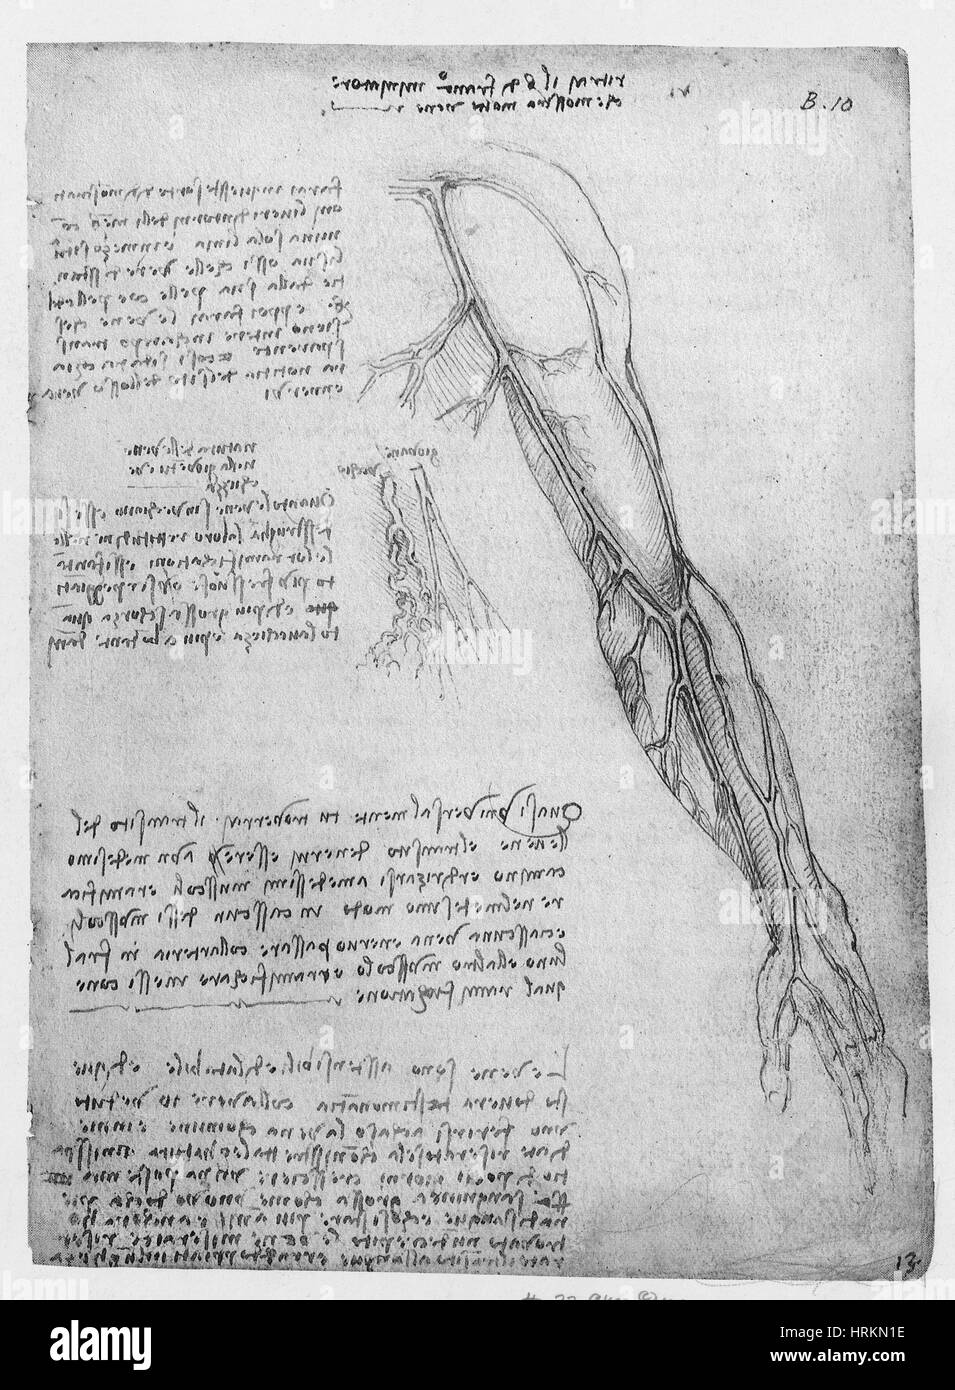 Da Vinci Superficial Vessels of the Arm - Stock Image